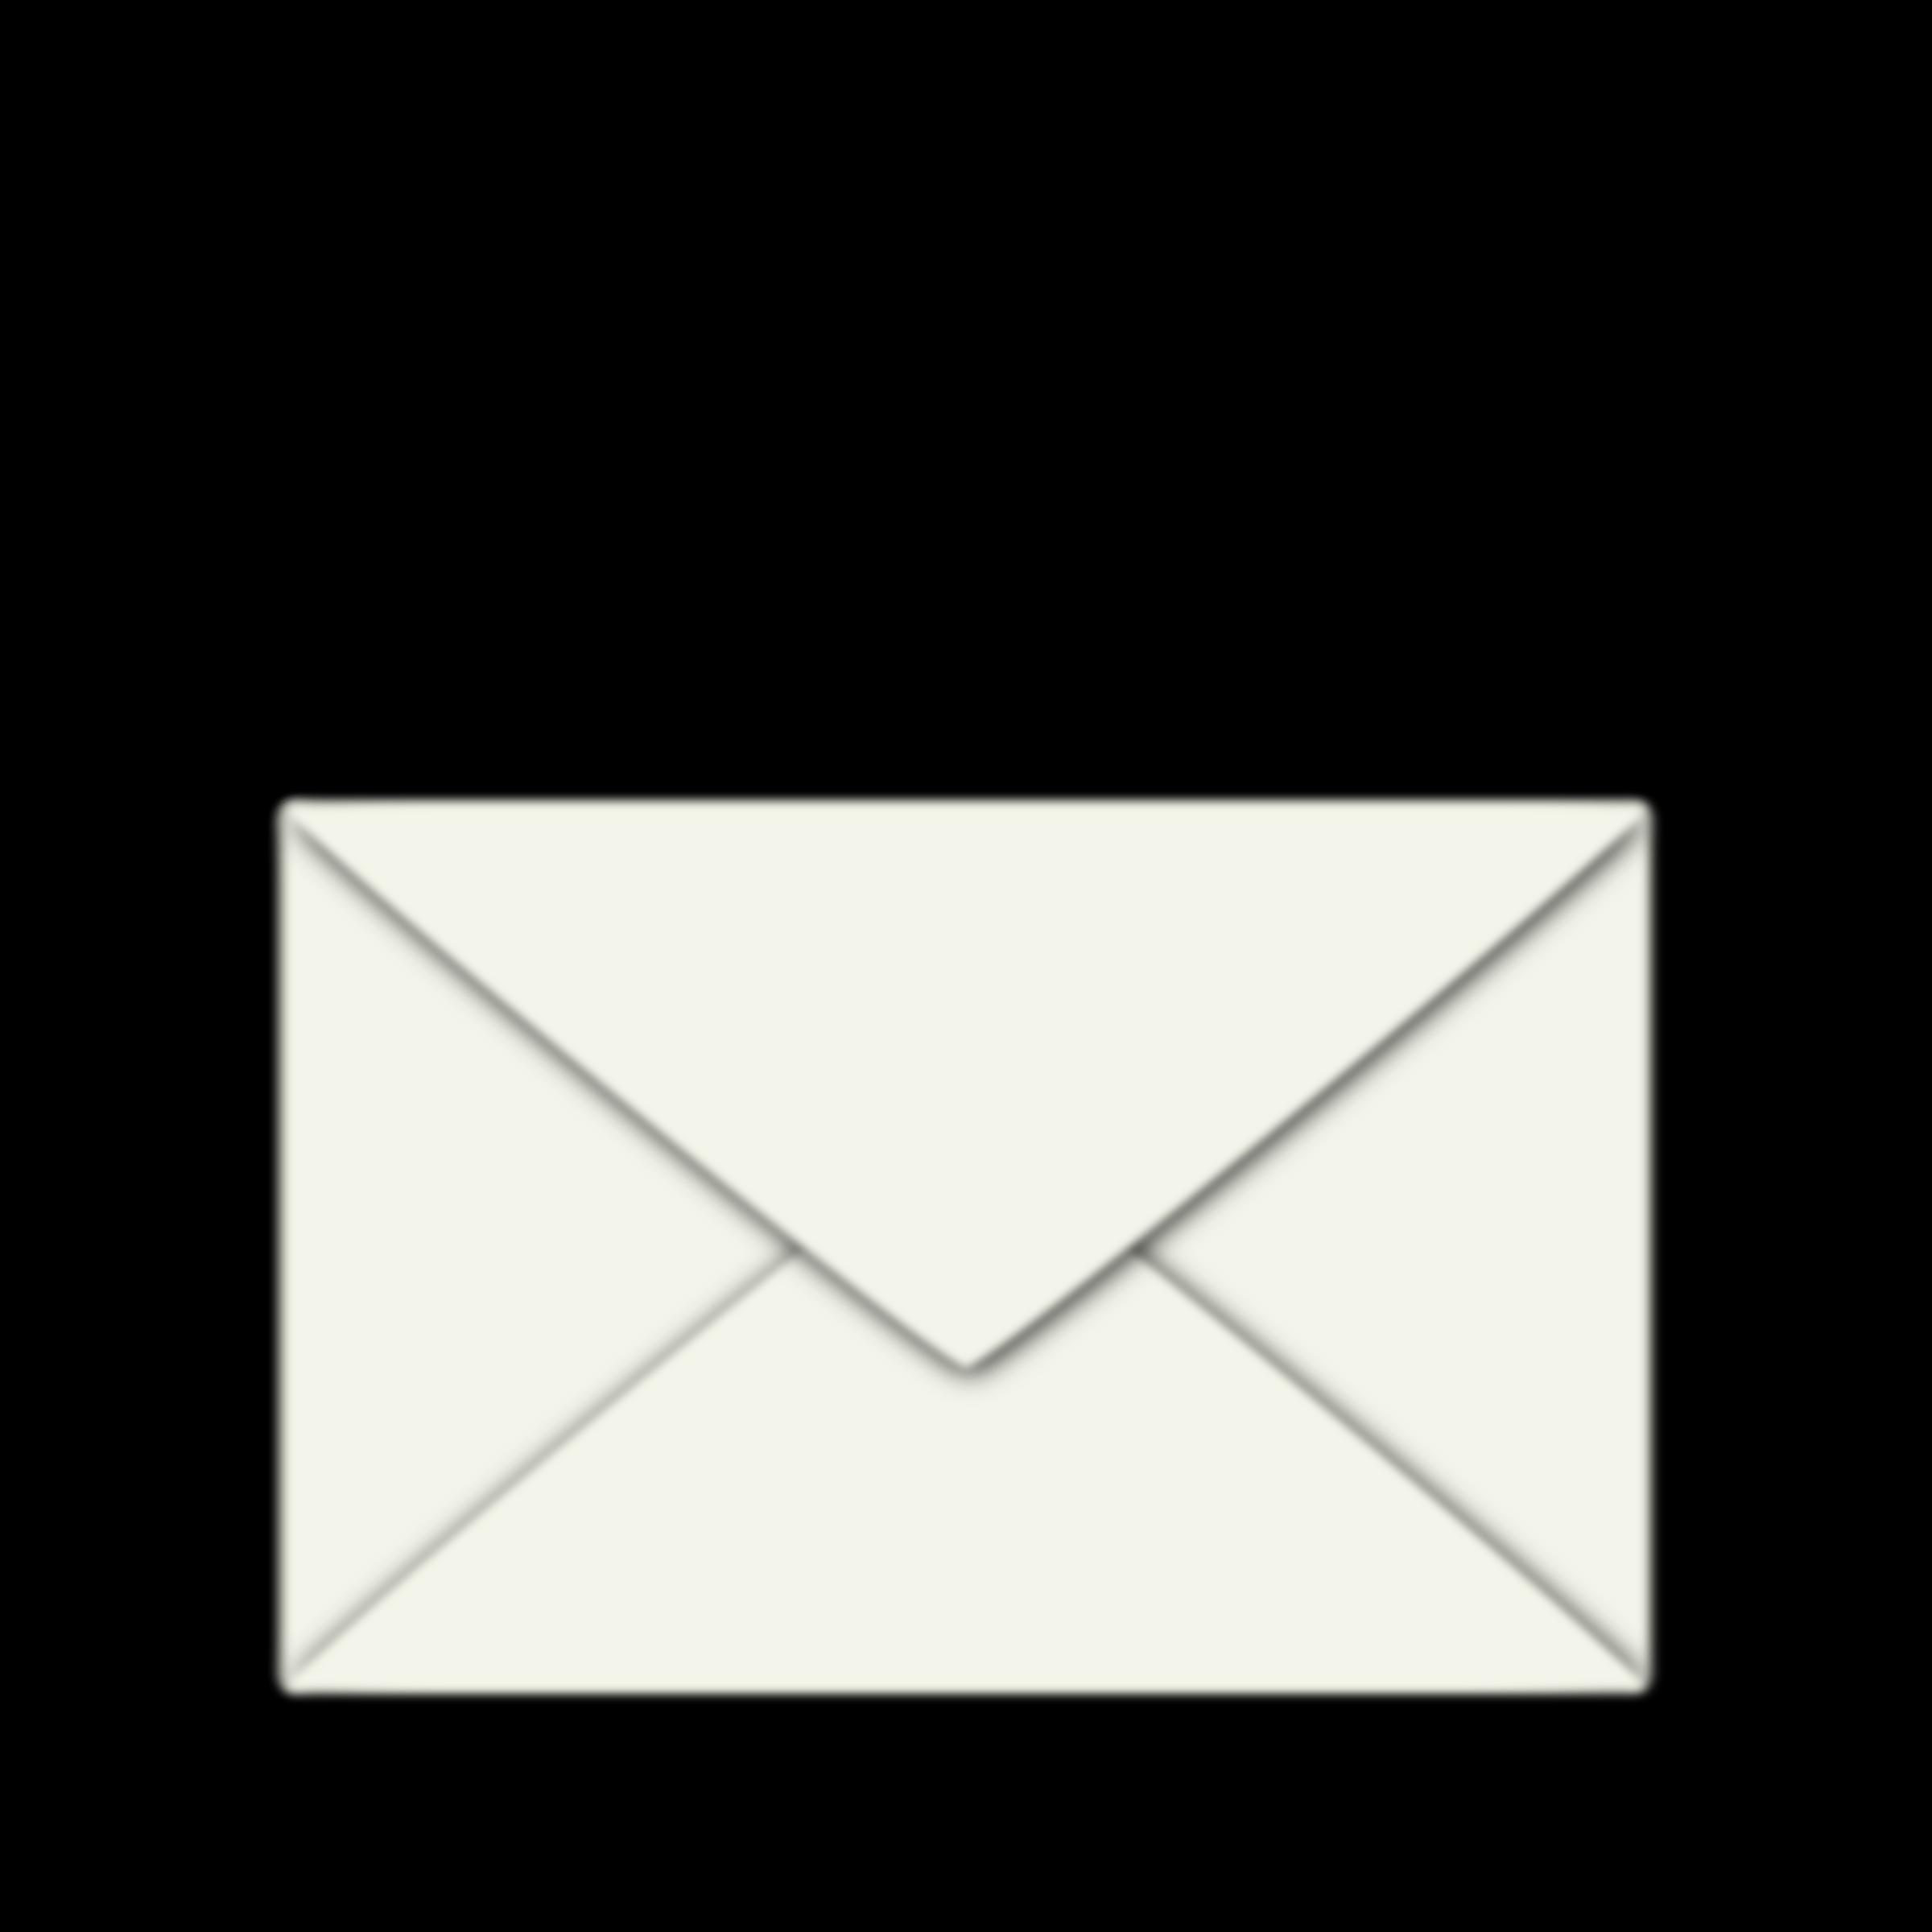 envelope clipart closed